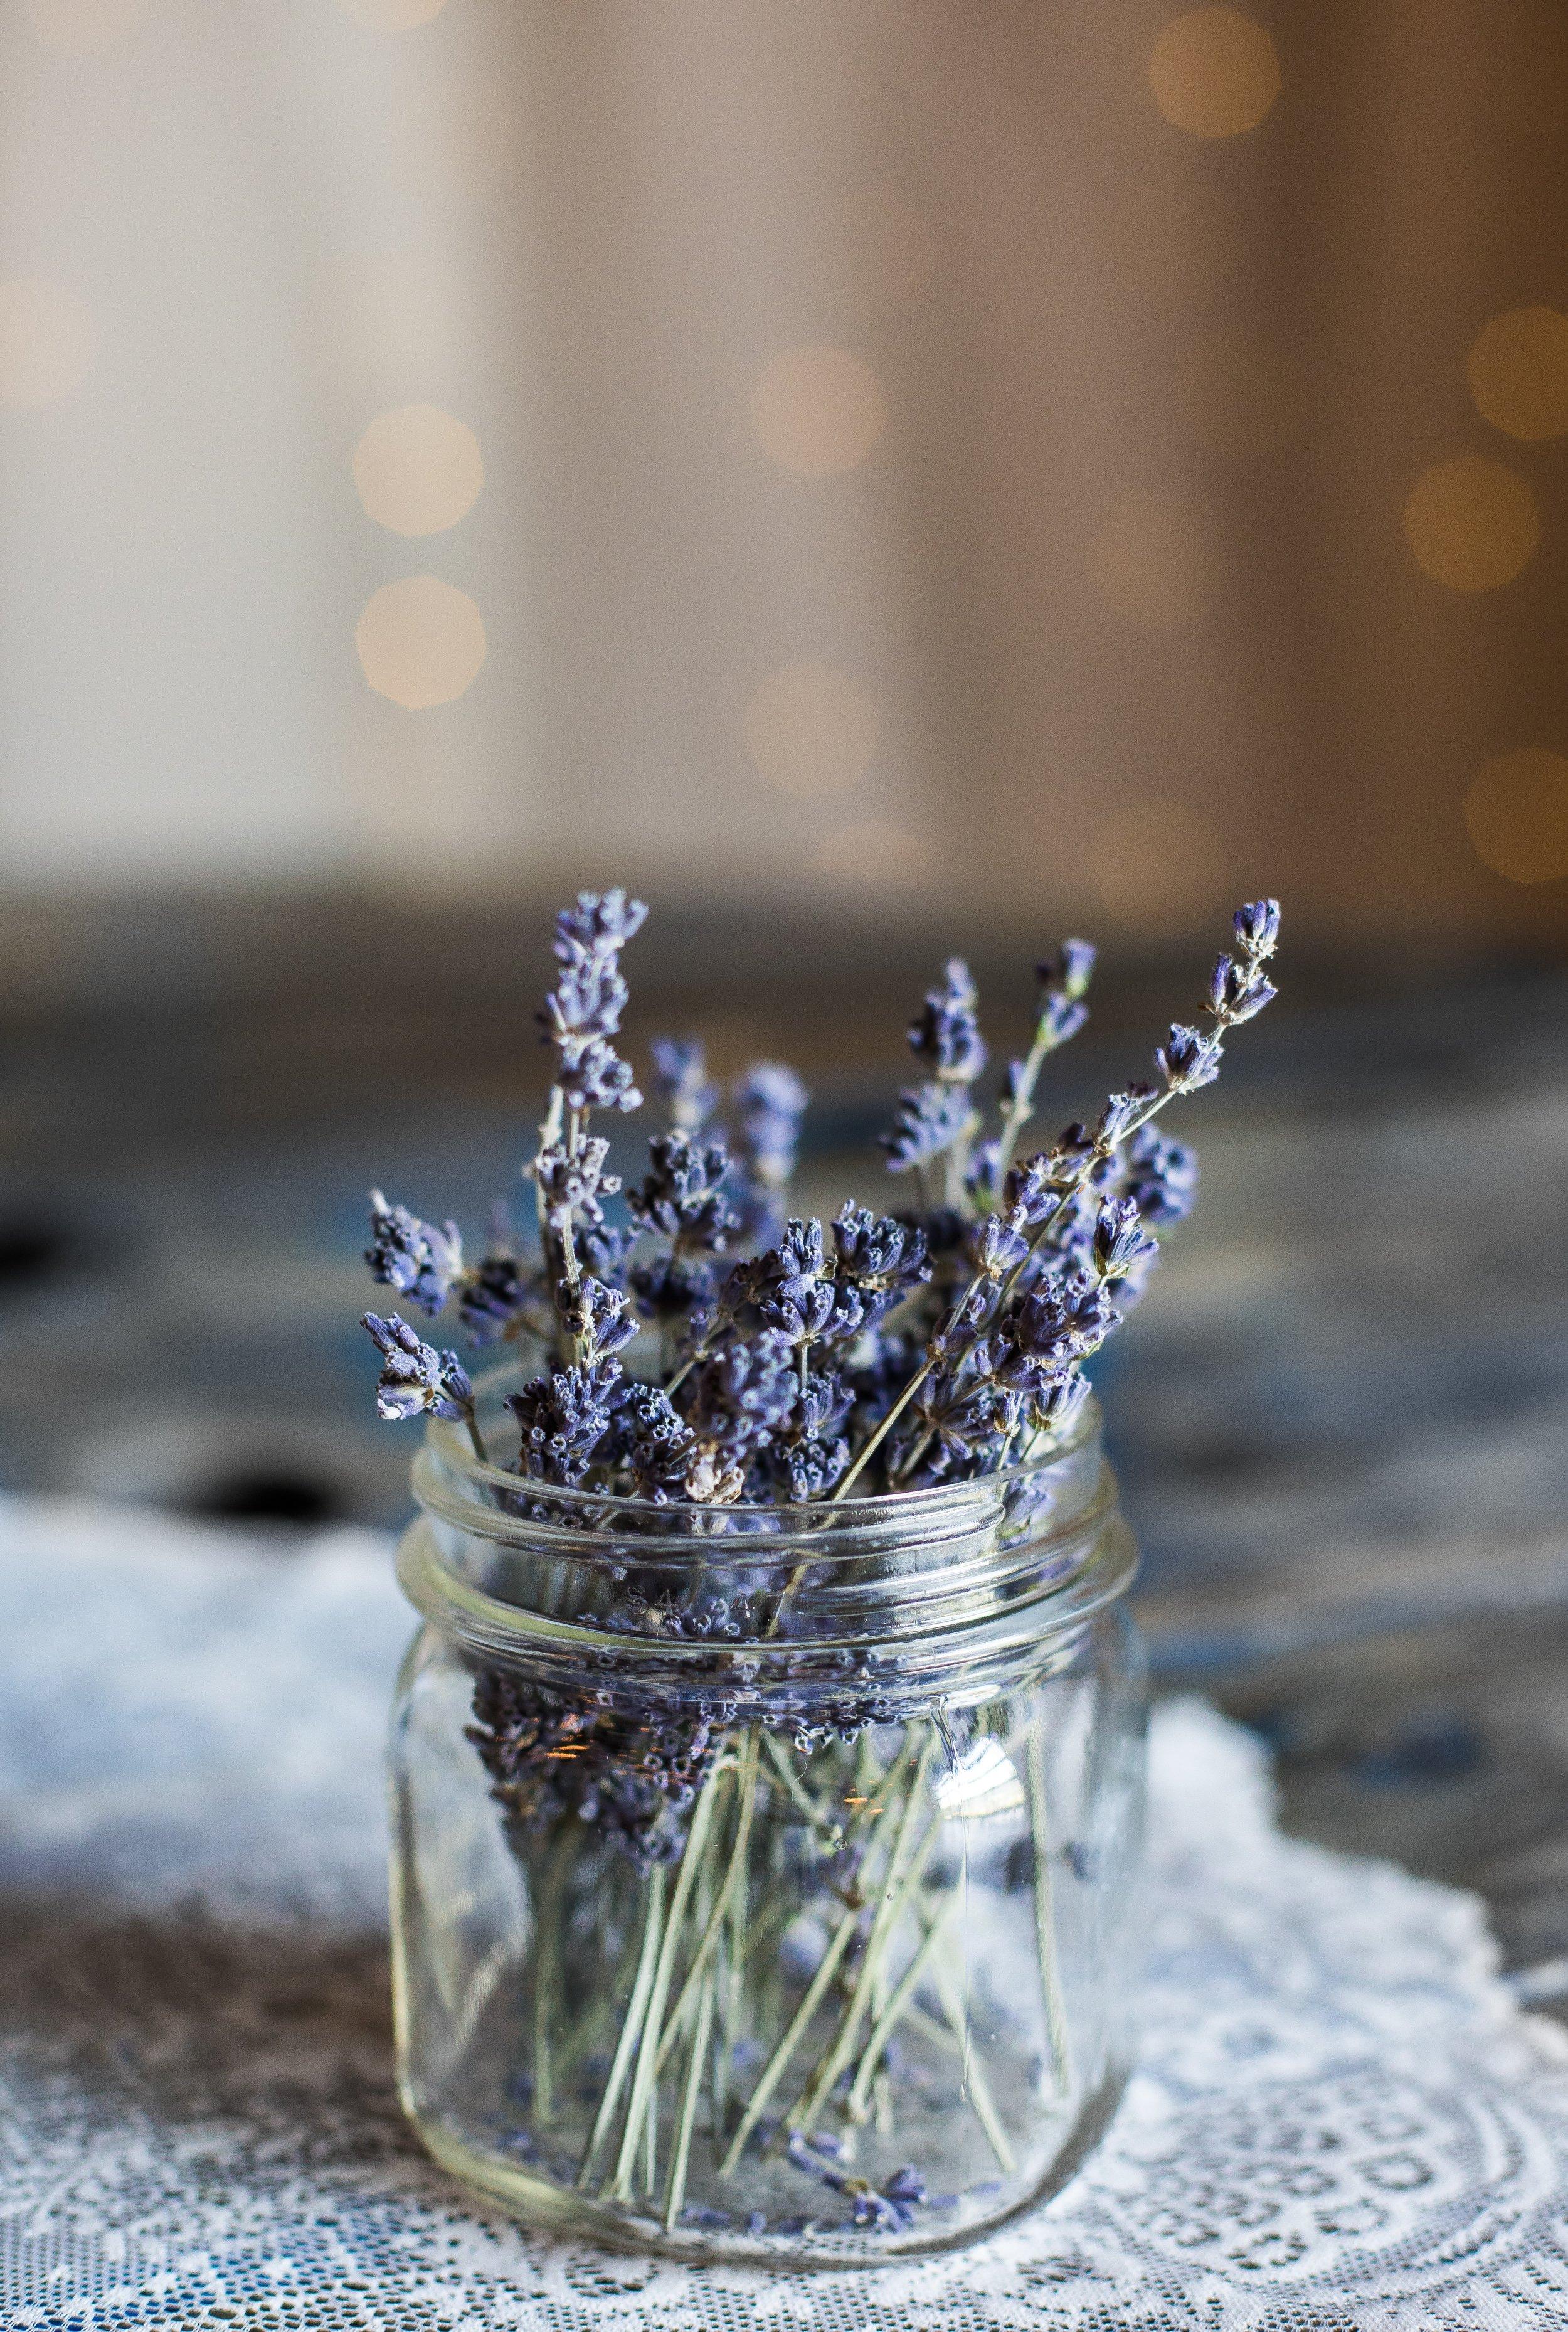 lavender-in-jar-peaceful-calming-healing